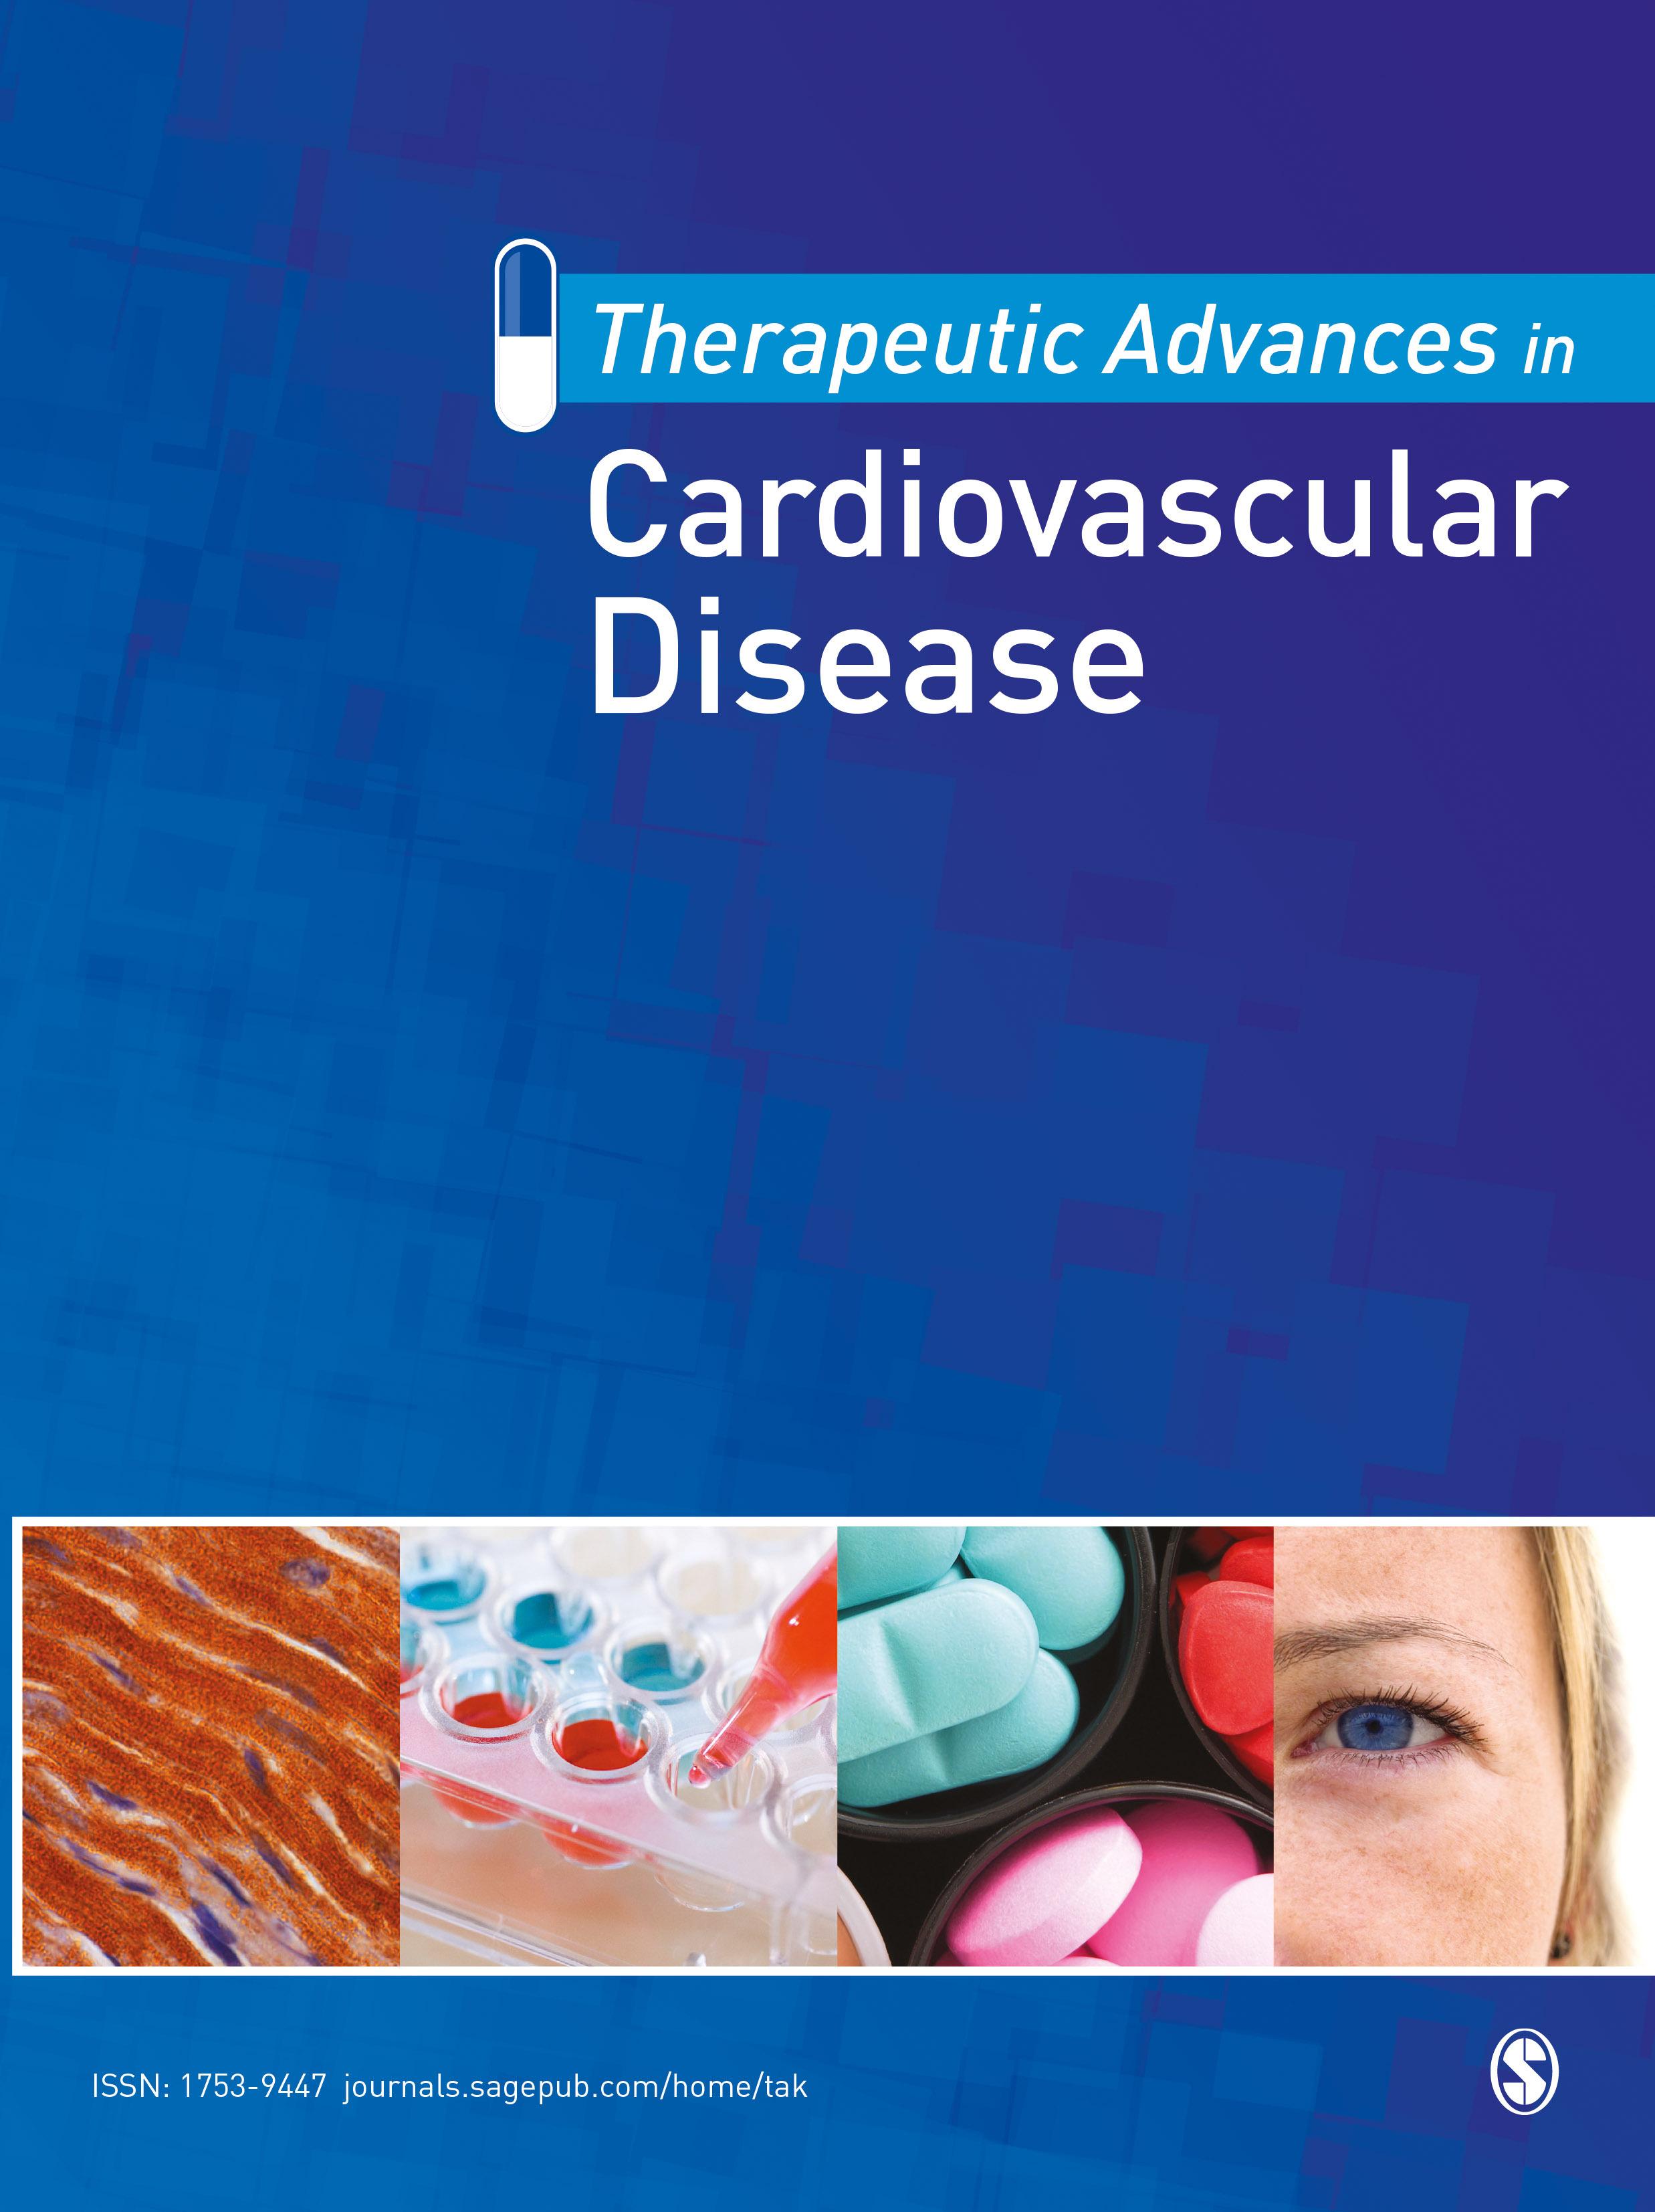 Therapeutic Advances in Cardiovascular Disease